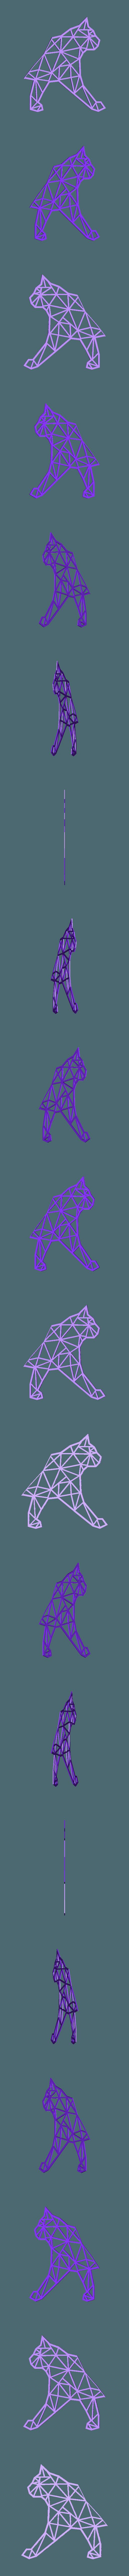 chat_un_b.stl Download free STL file WALL CAT DECORATION • 3D printable design, Luci